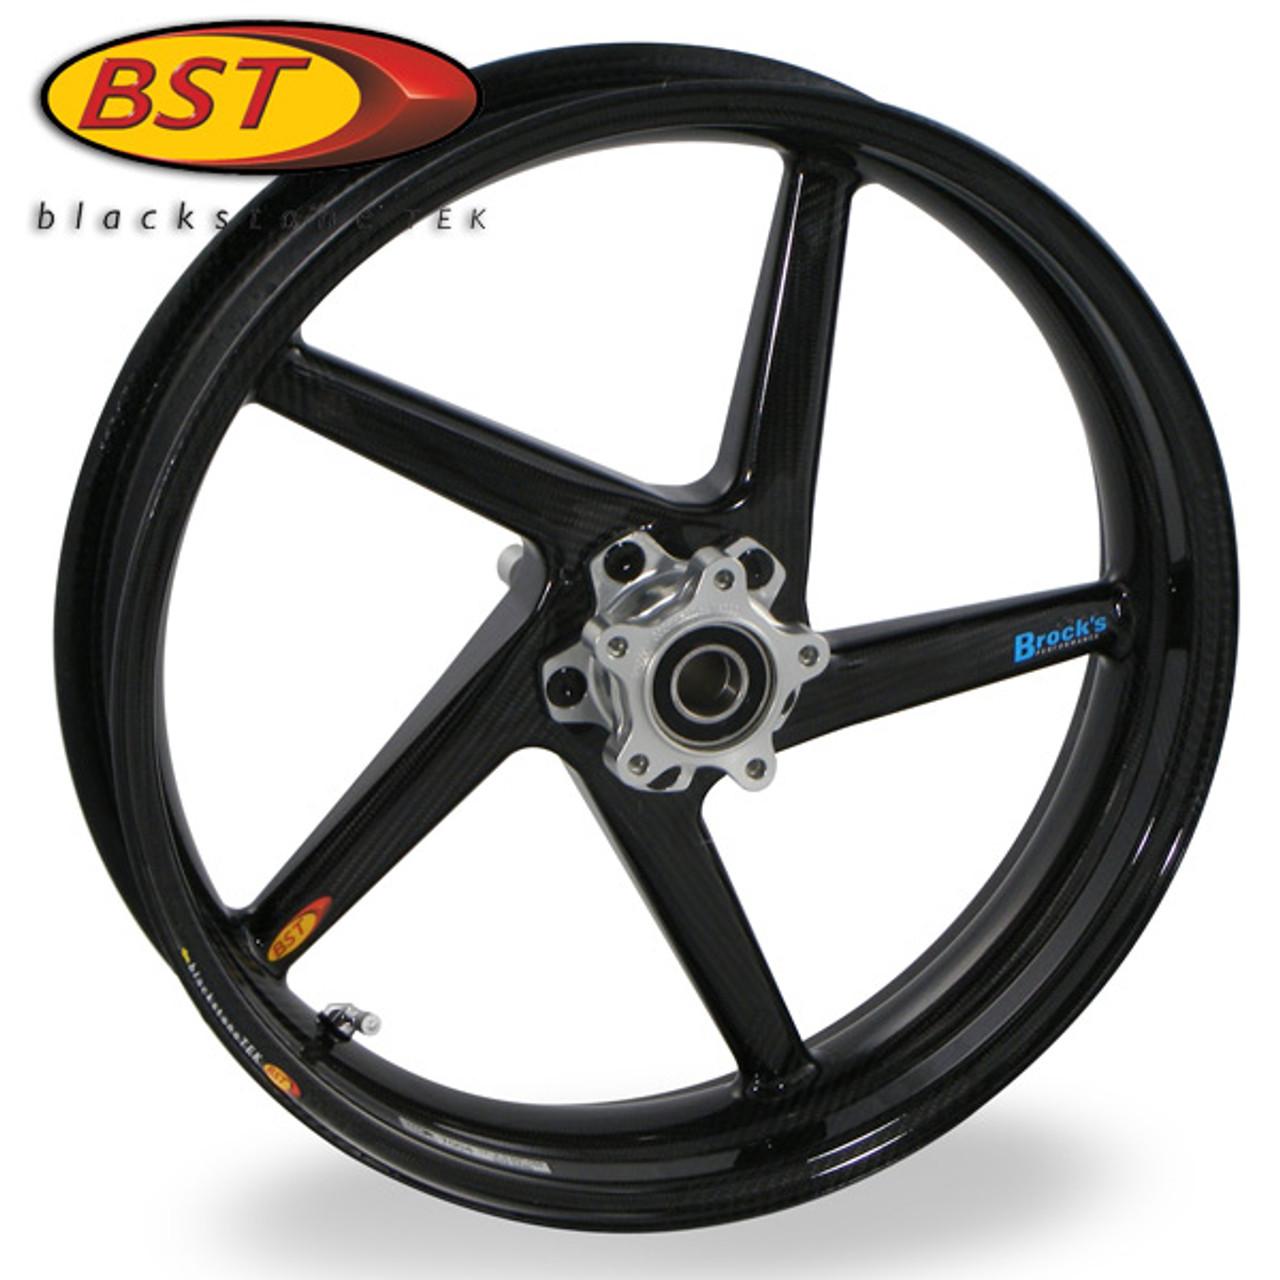 BST Carbon Fiber Front Wheel Honda CBR600RR 07-09